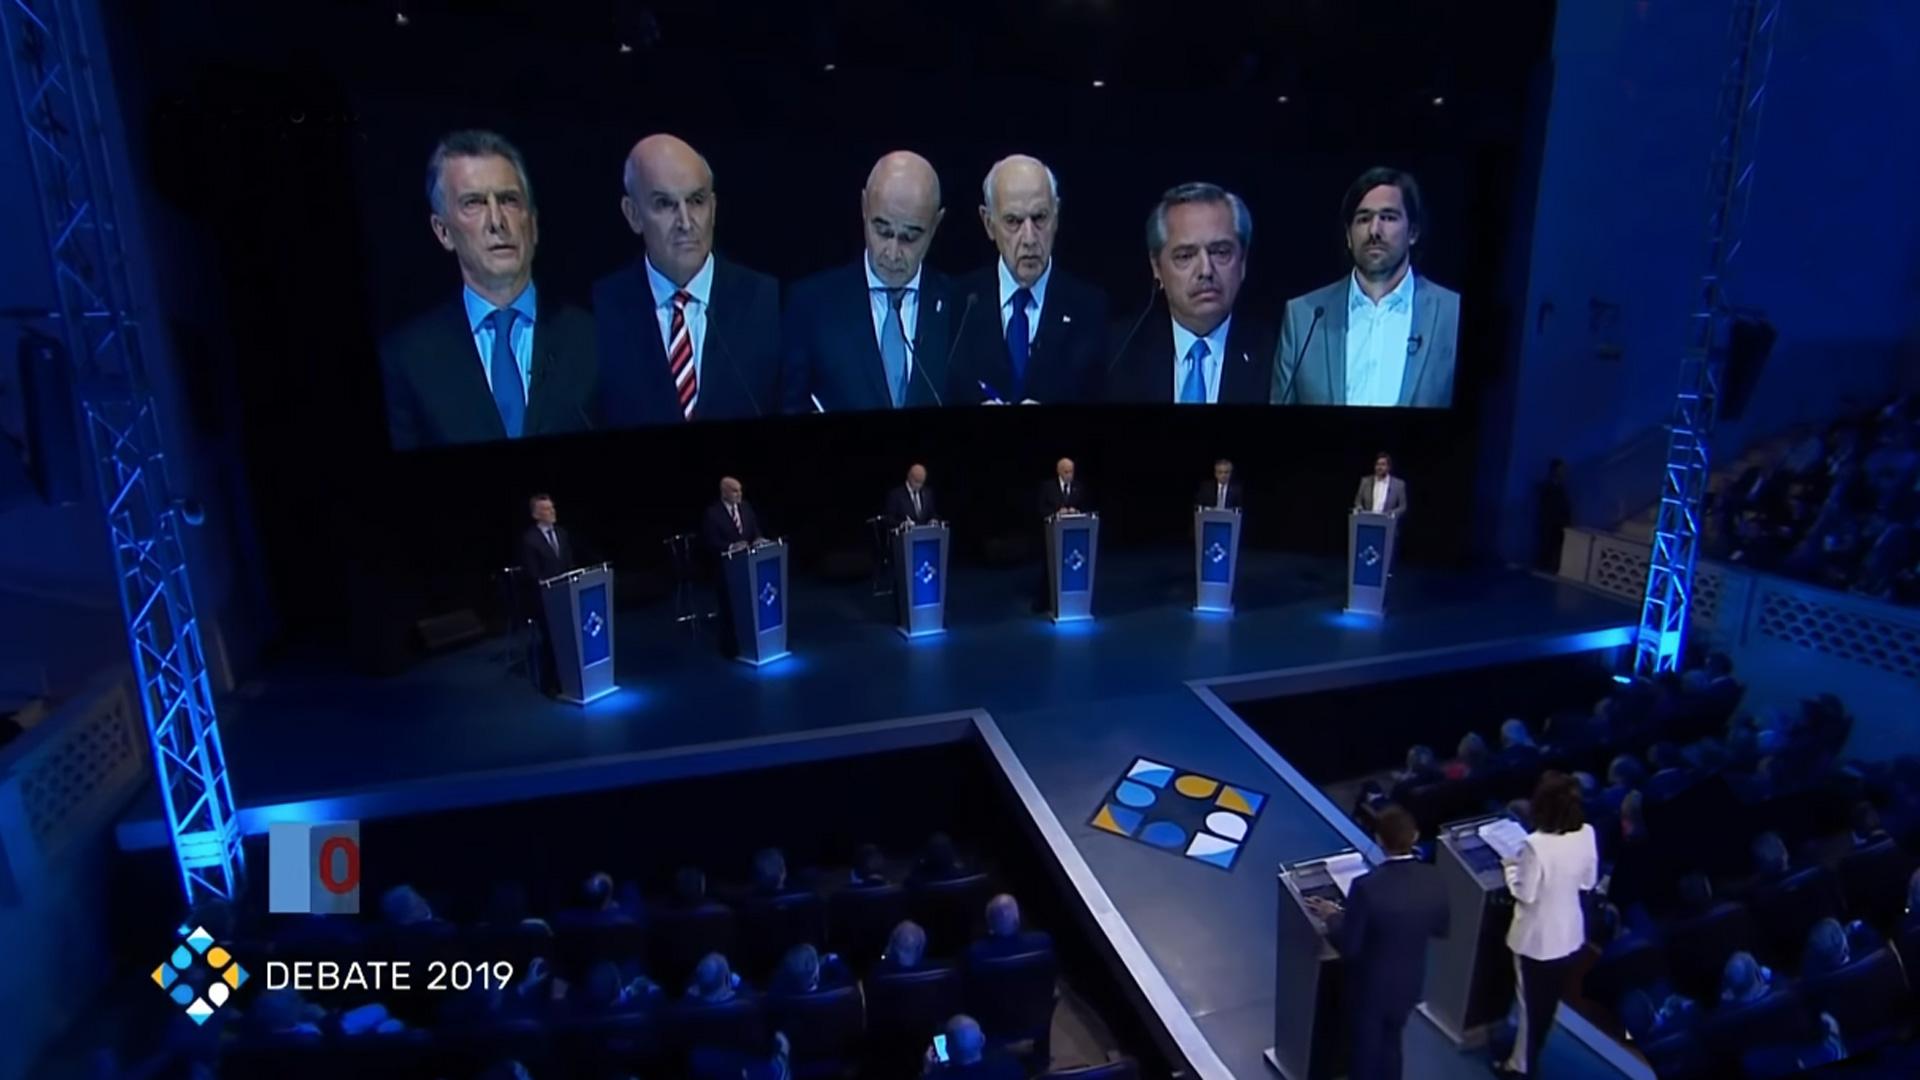 debate_2019_002